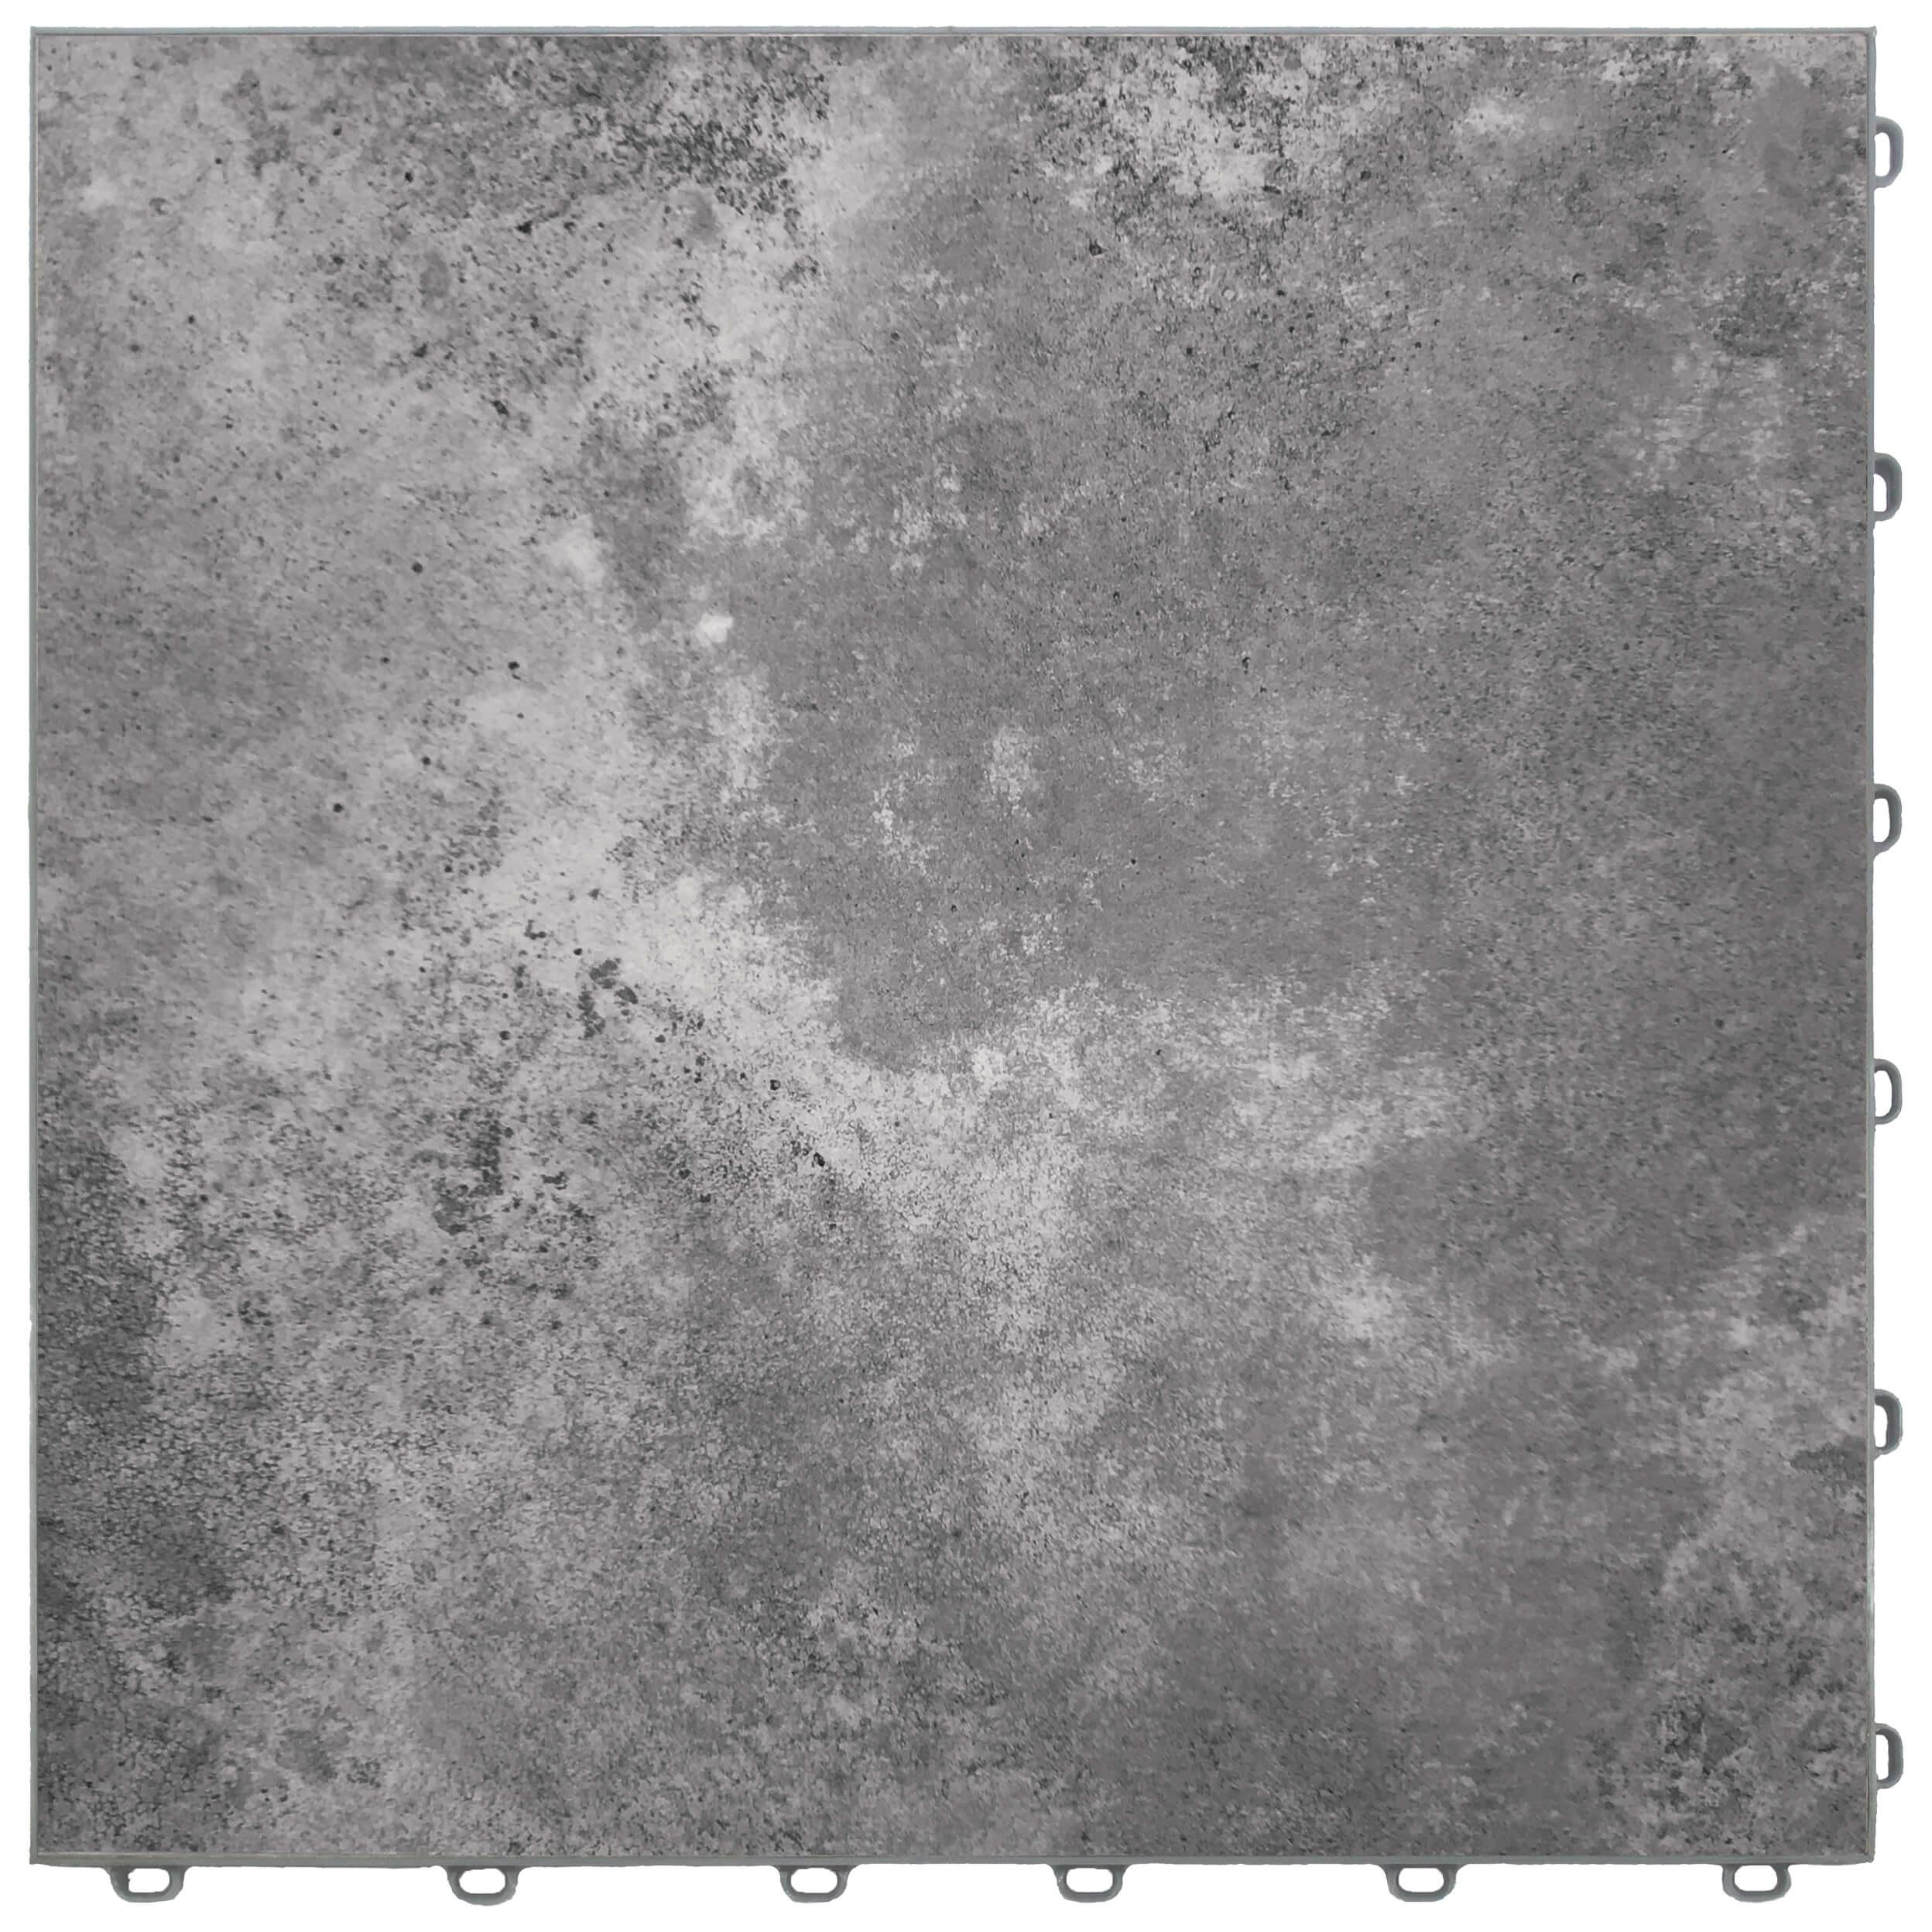 Polished concrete floor tiles